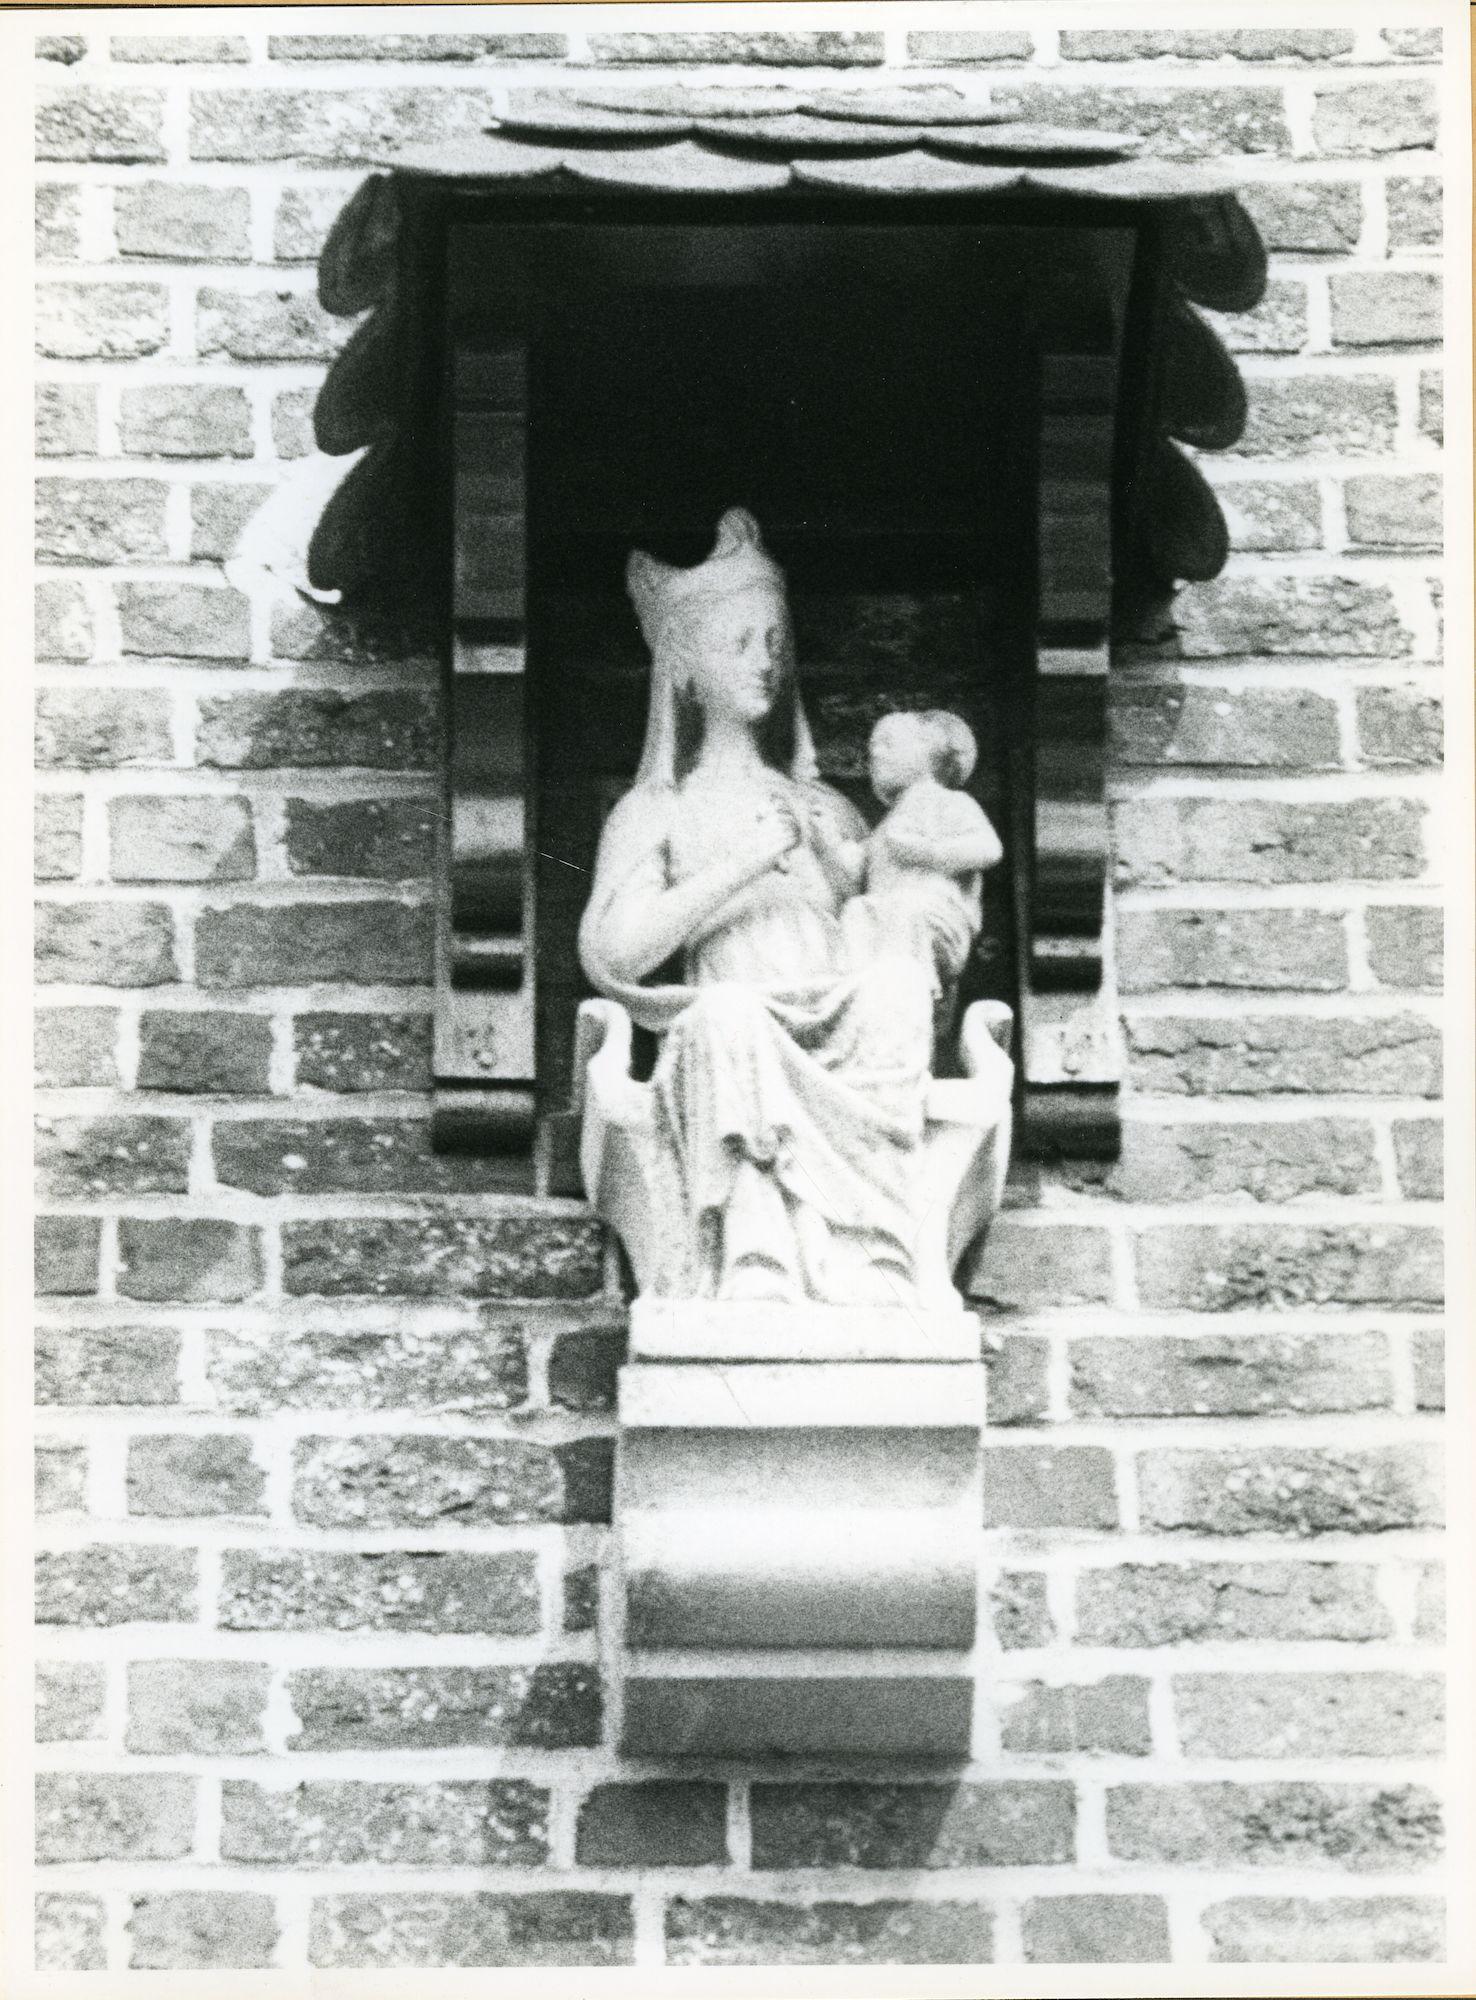 Oostakker: Antwerpsesteenweg 42: Gevelbeeld, 1979